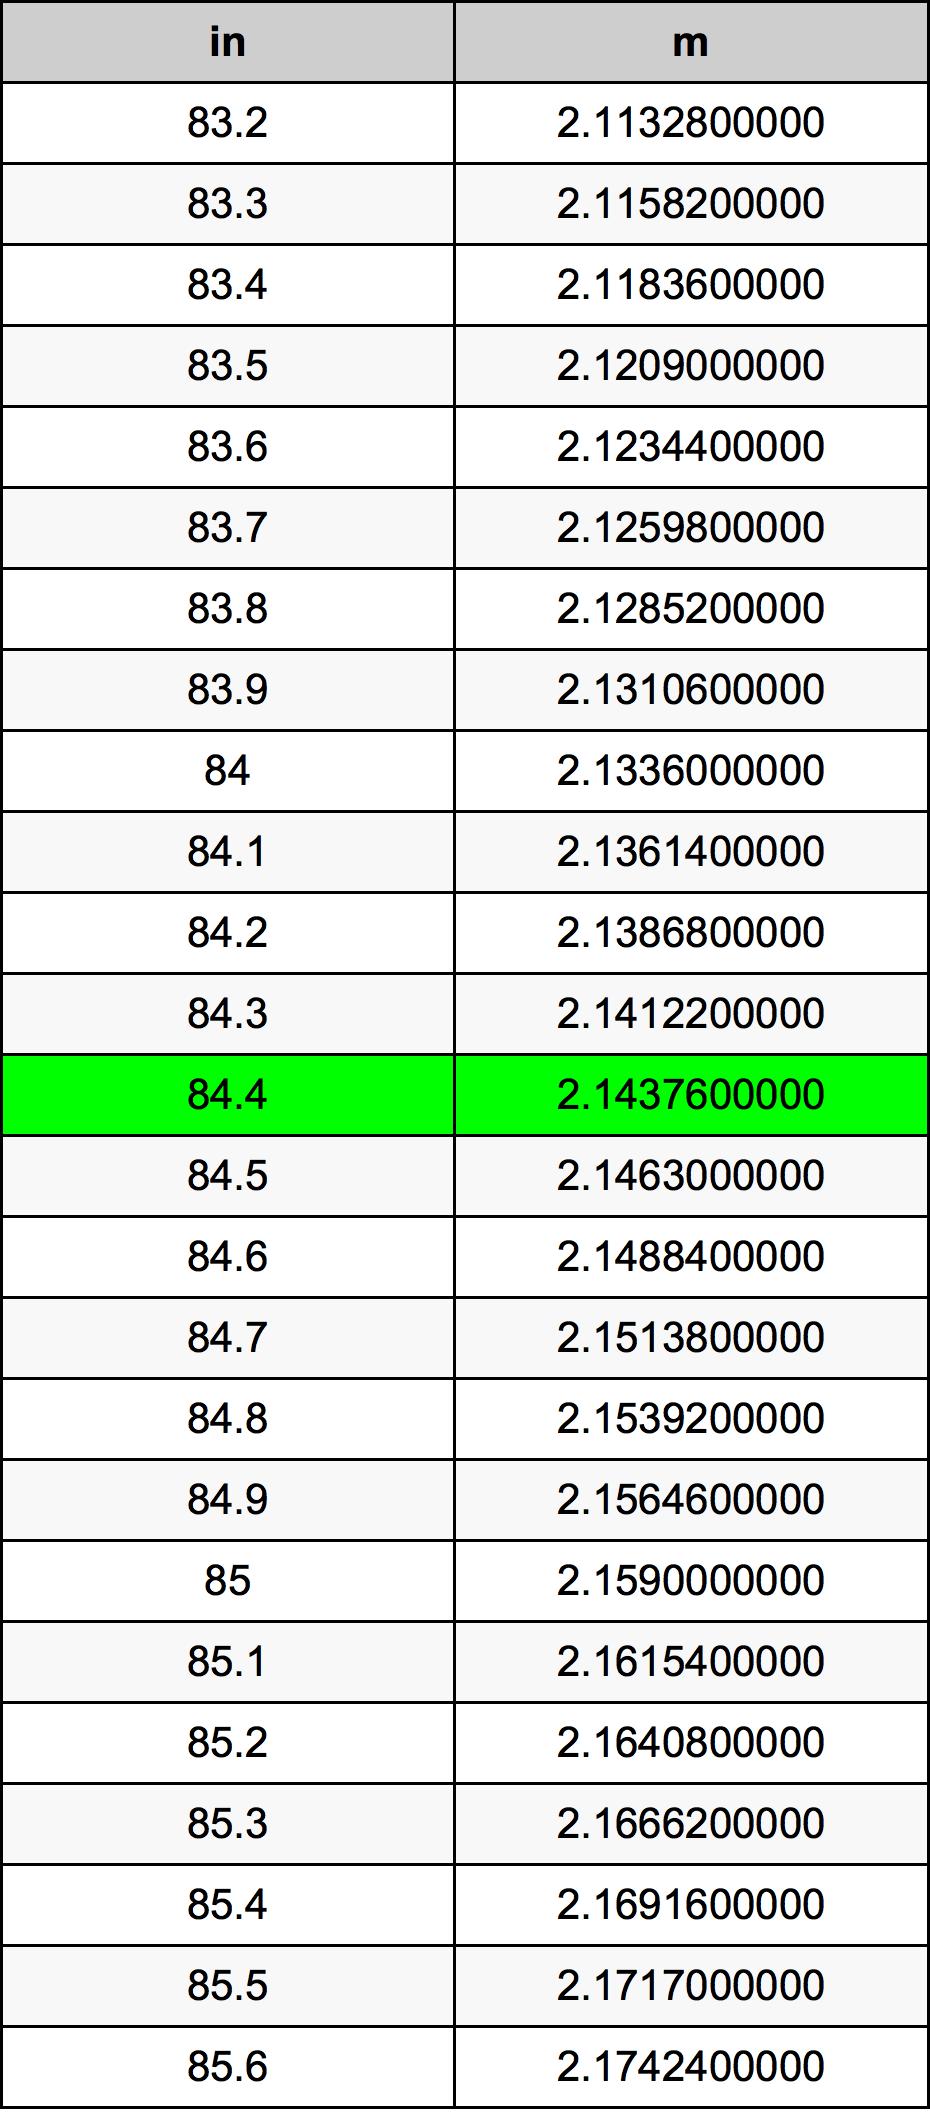 84.4 Inch konverteringstabell